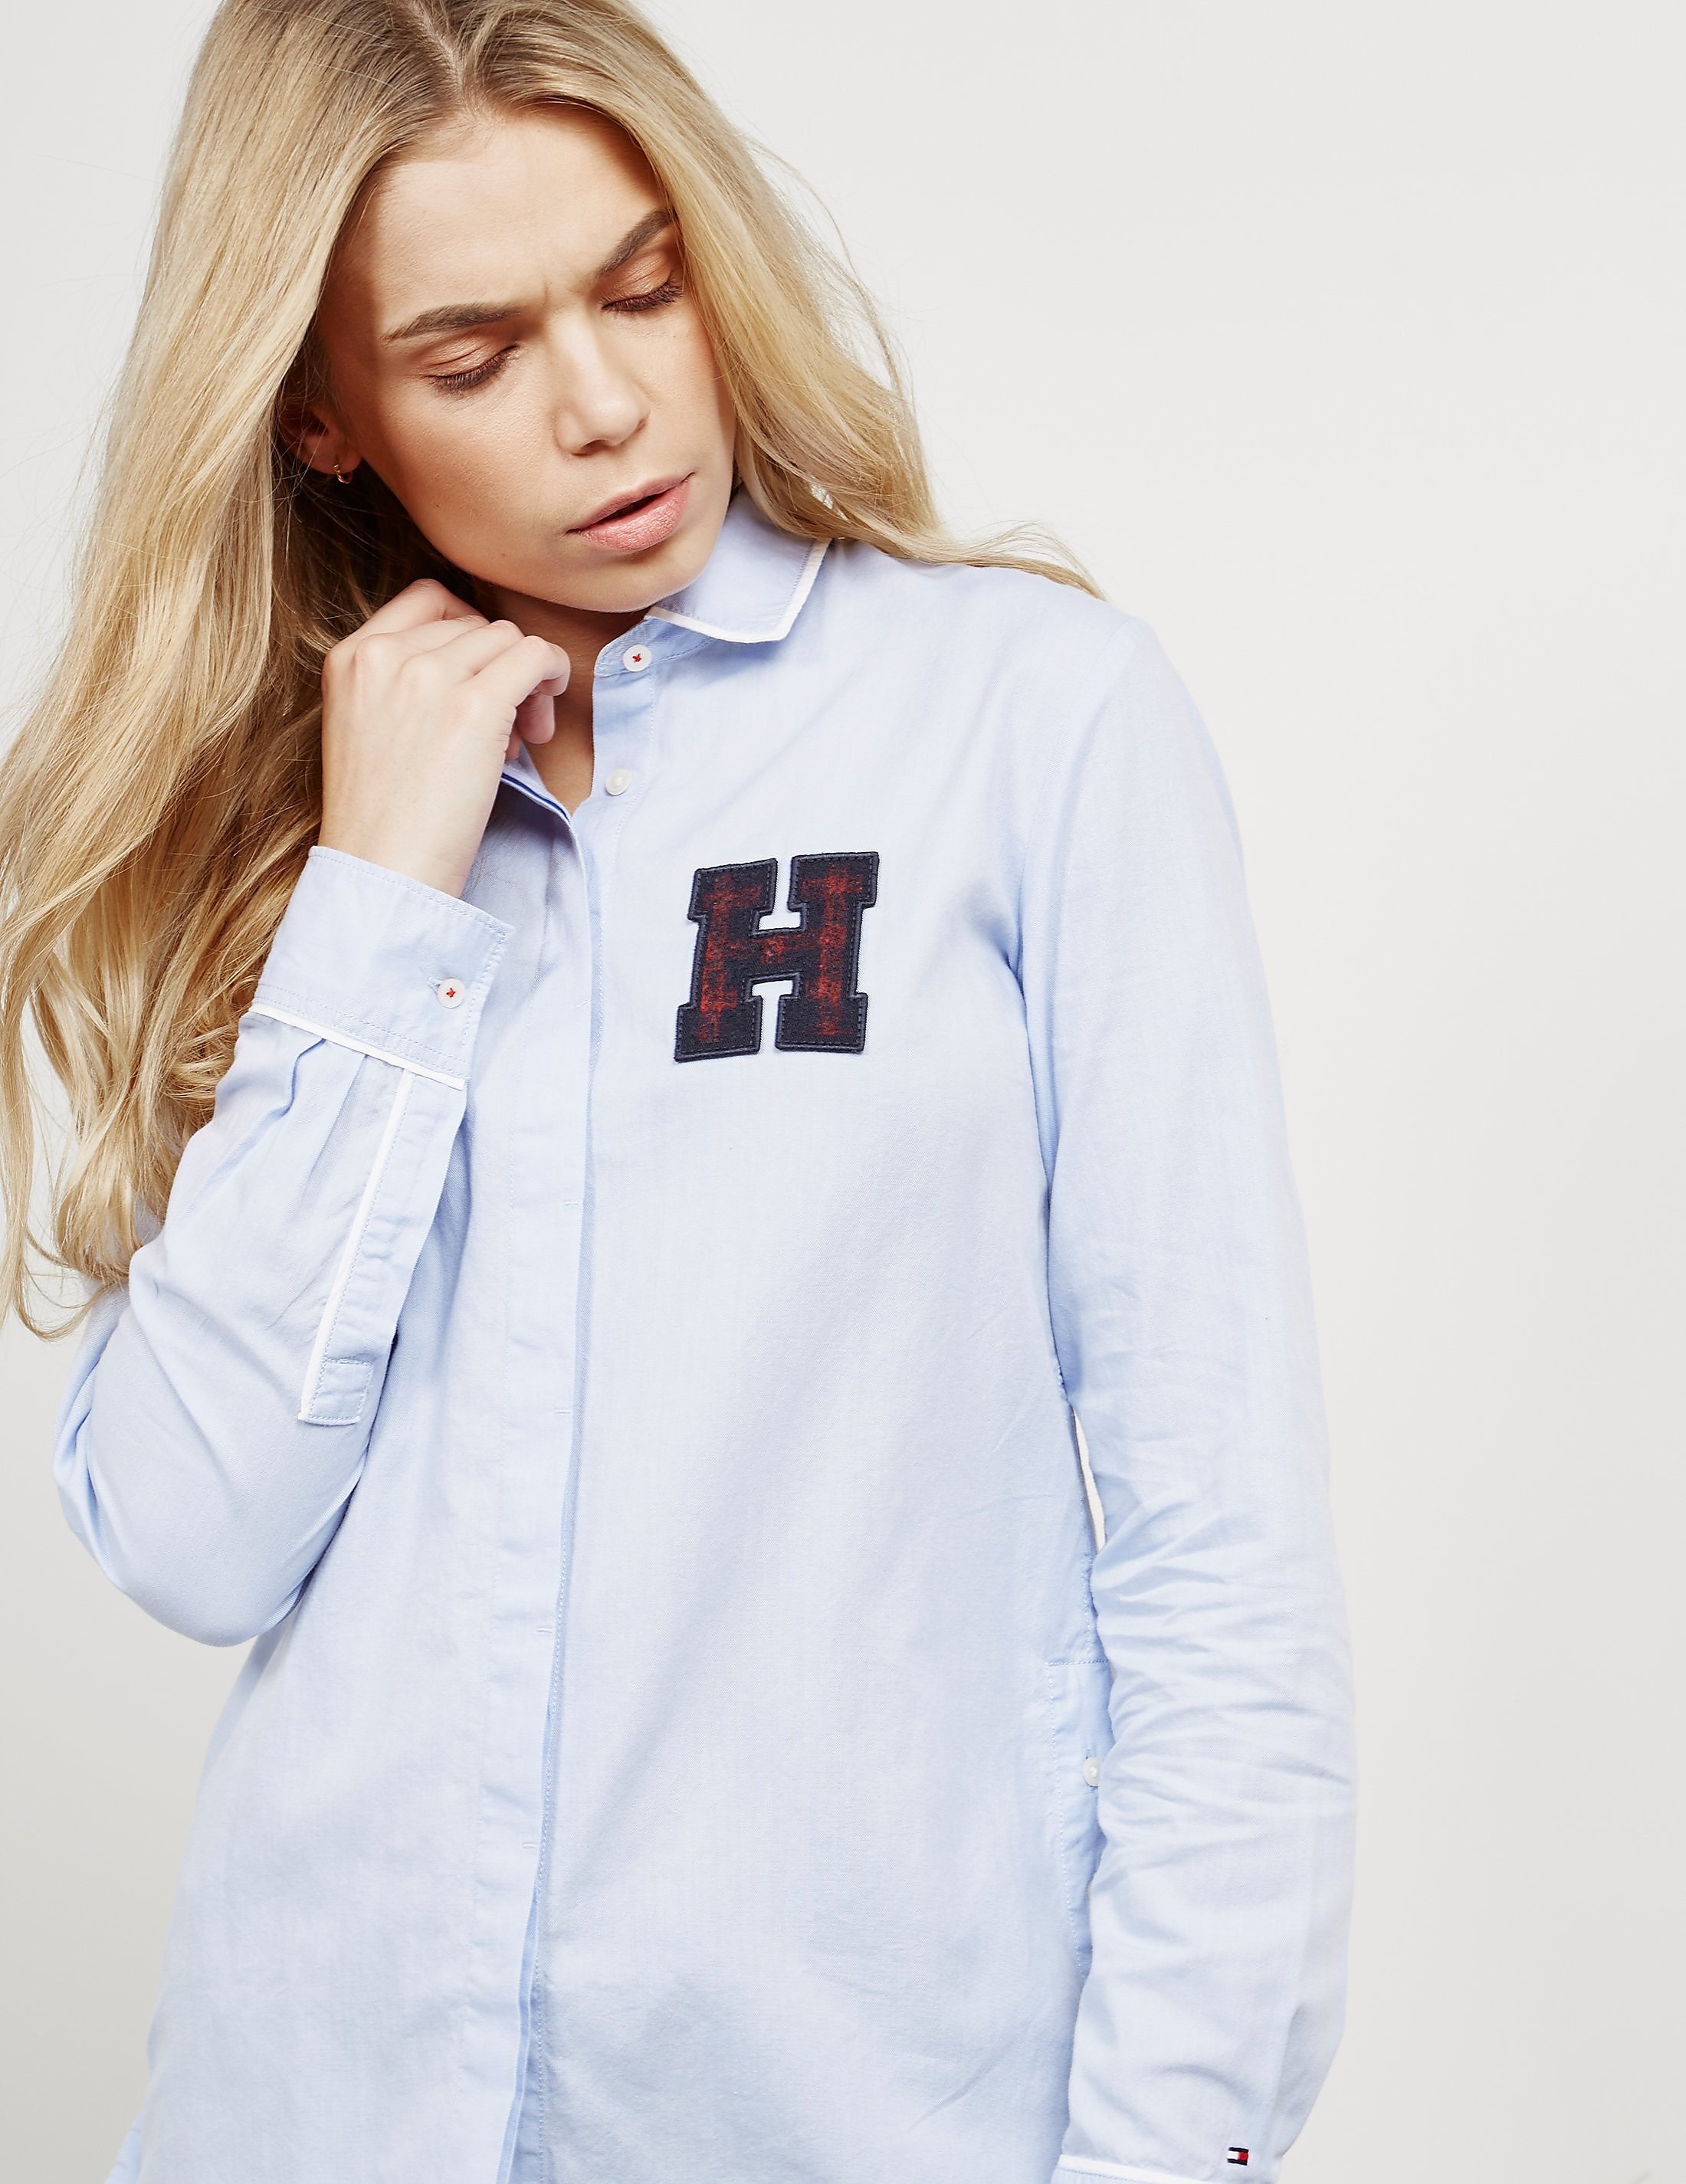 Tommy Hilfiger Julia Long Sleeve Shirt - Online Exclusive